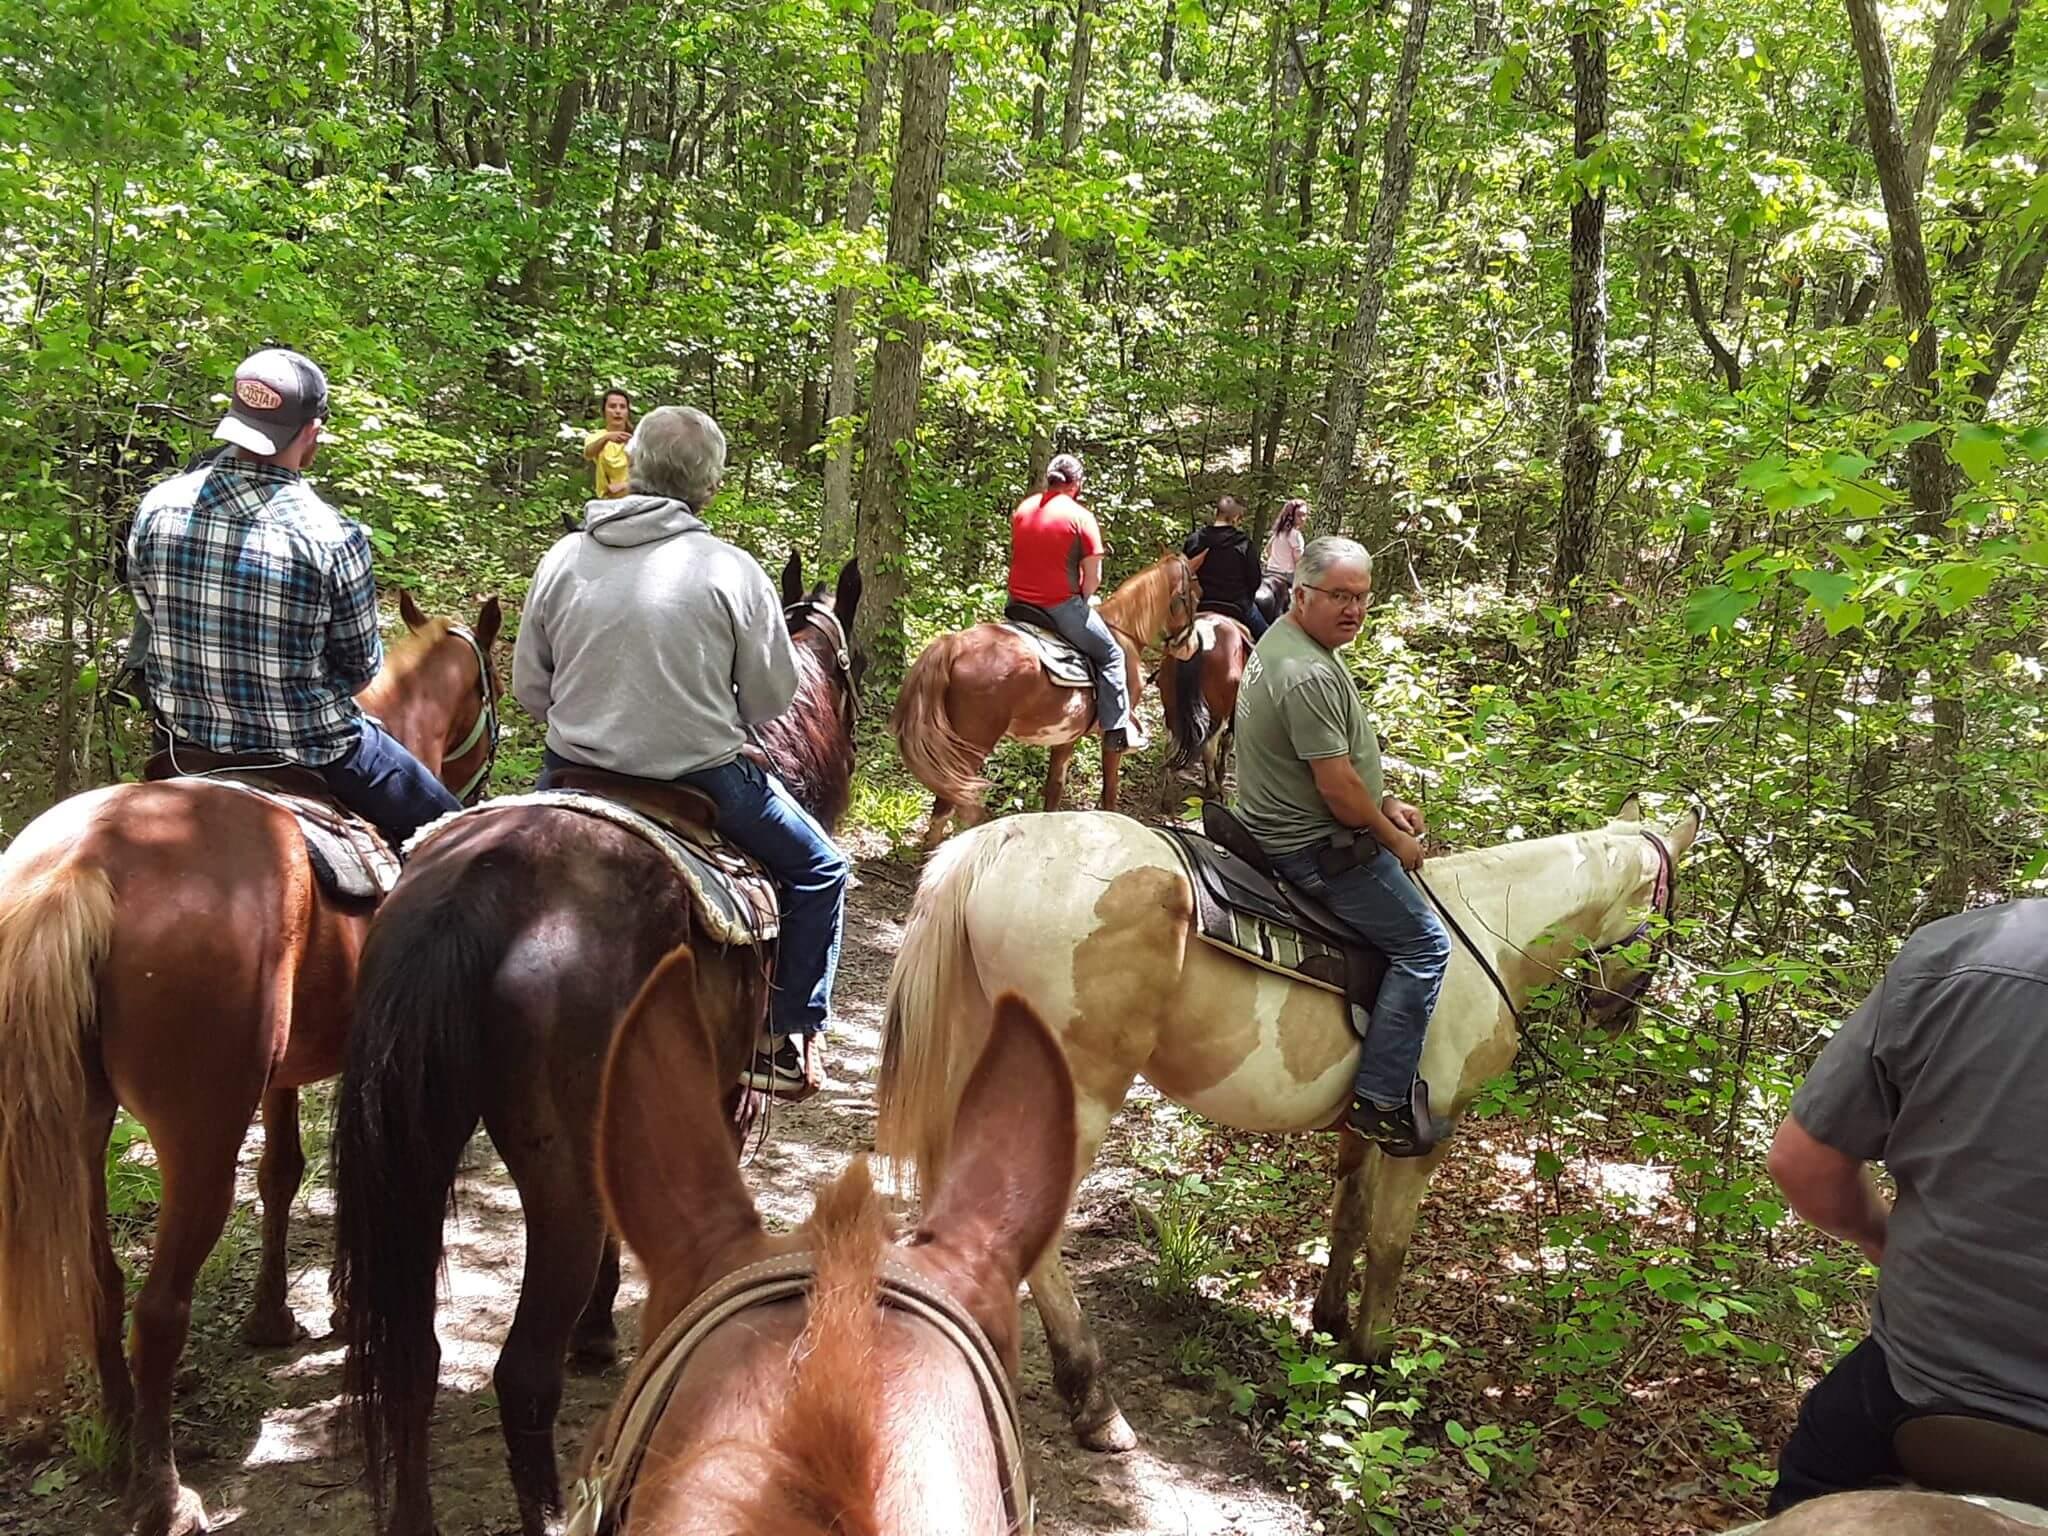 A little horseback riding in Nashville TN